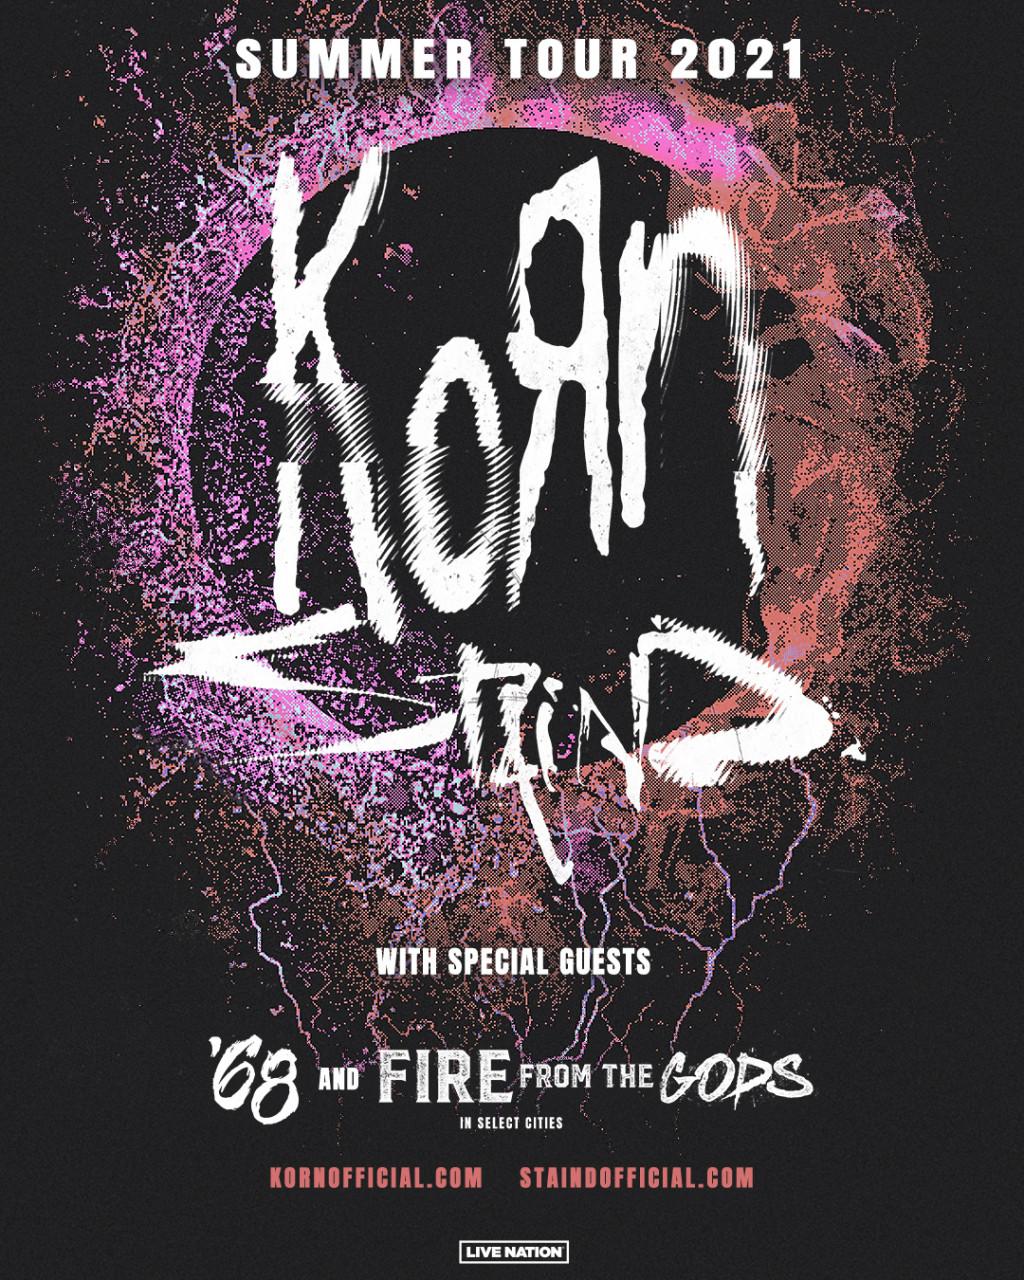 Korn-Staind-Tour-2021-6e28f4de-3e5b-410d-b9dd-89905310036_20210512-223112_1